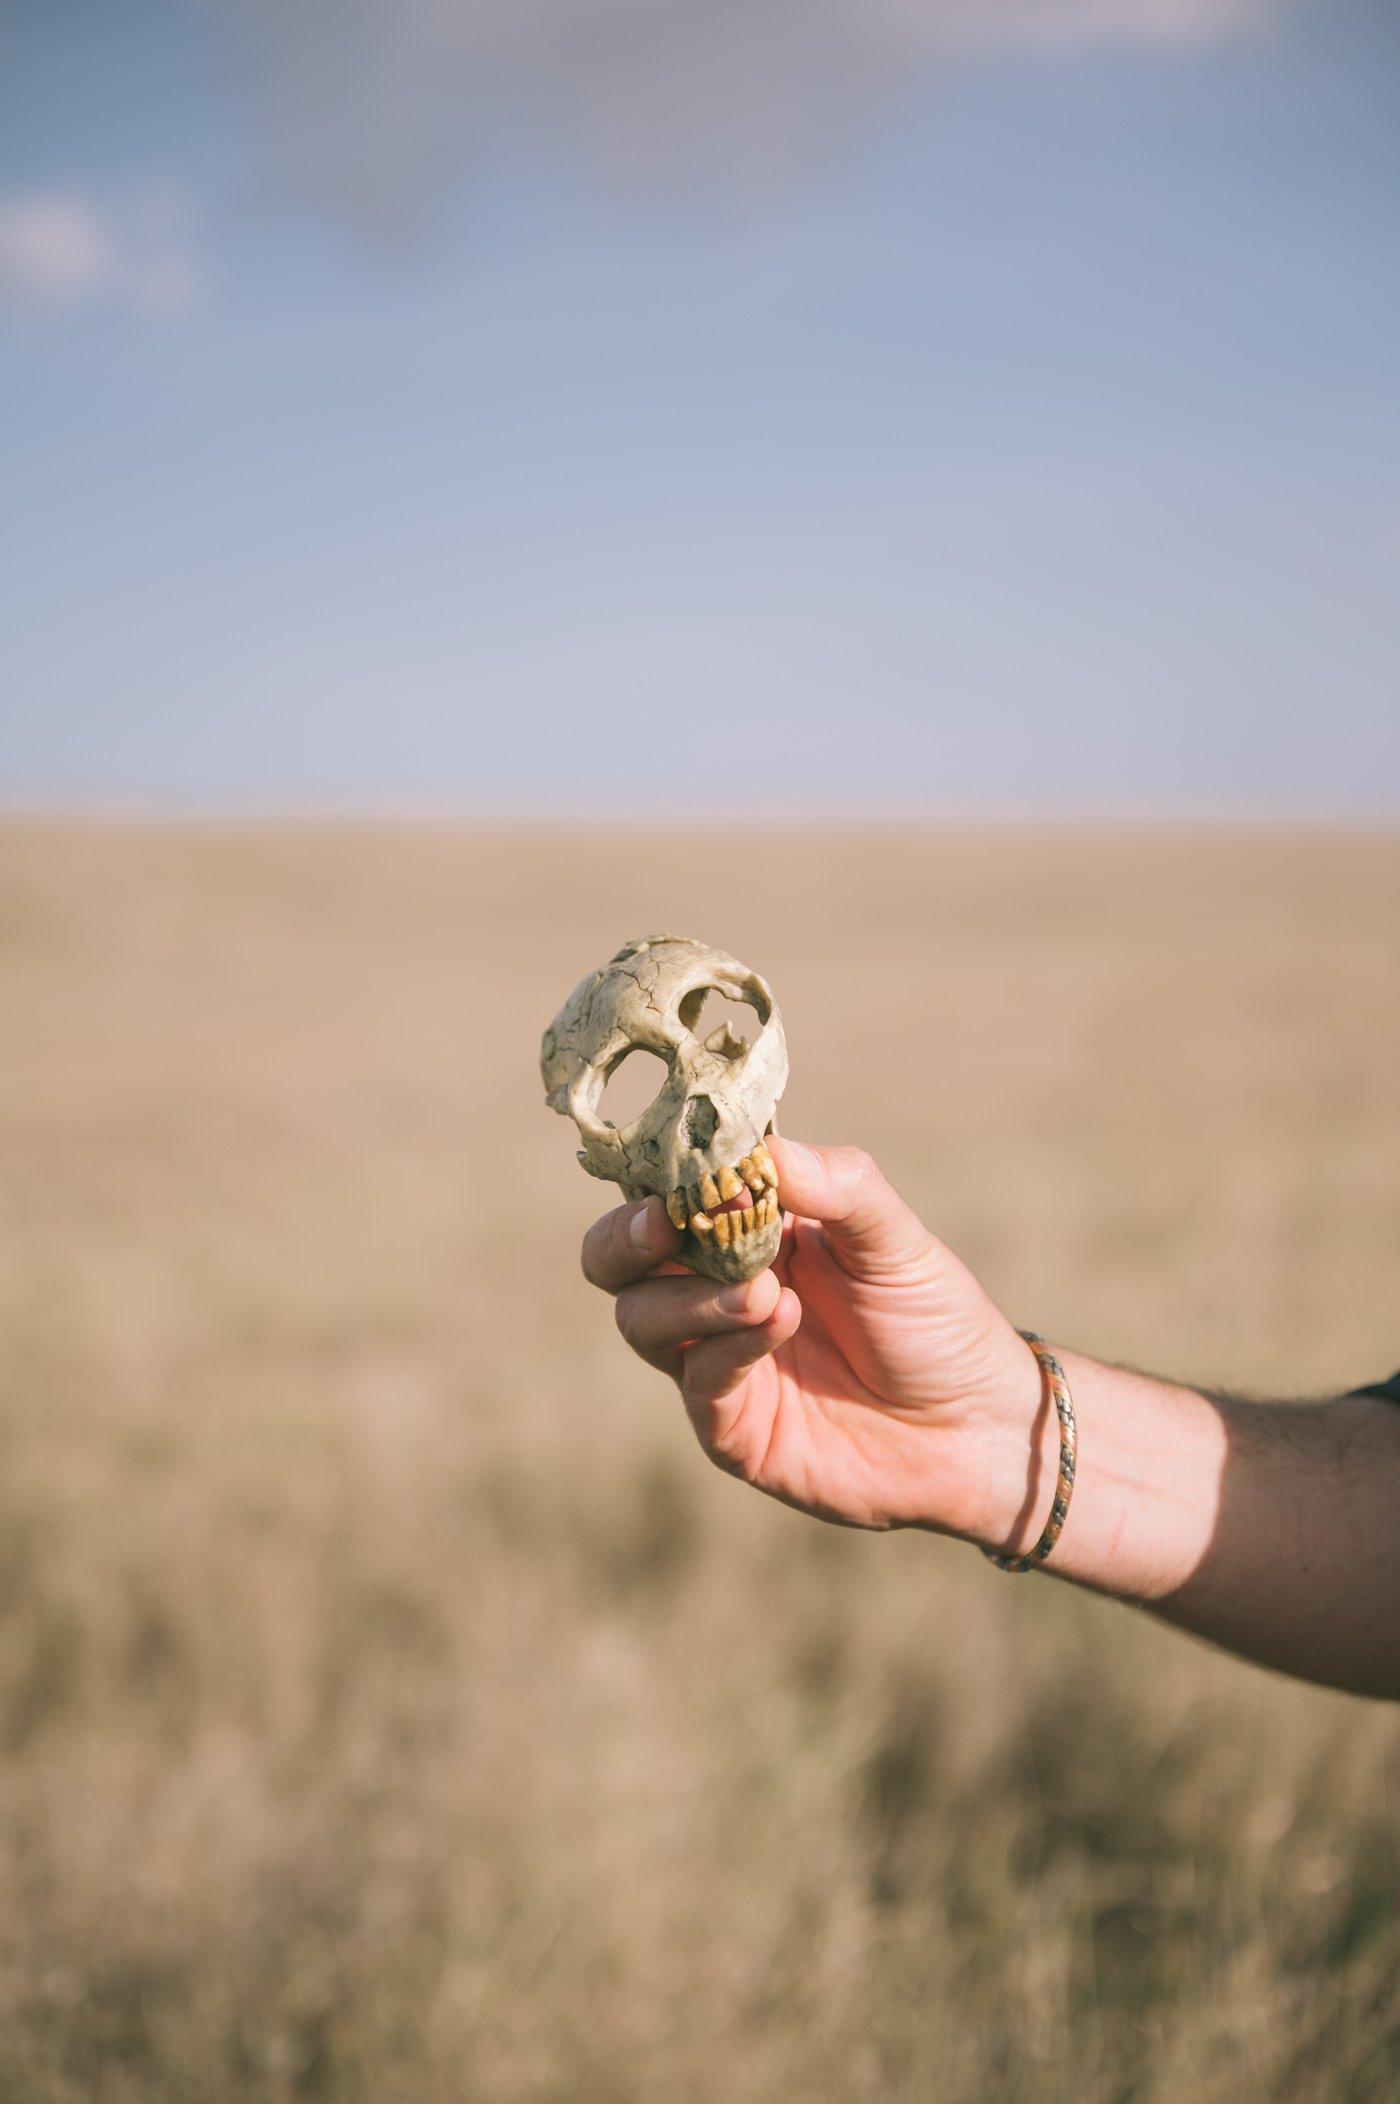 Hand Axe Site at Lewa Wildlife Conservancy Kenya